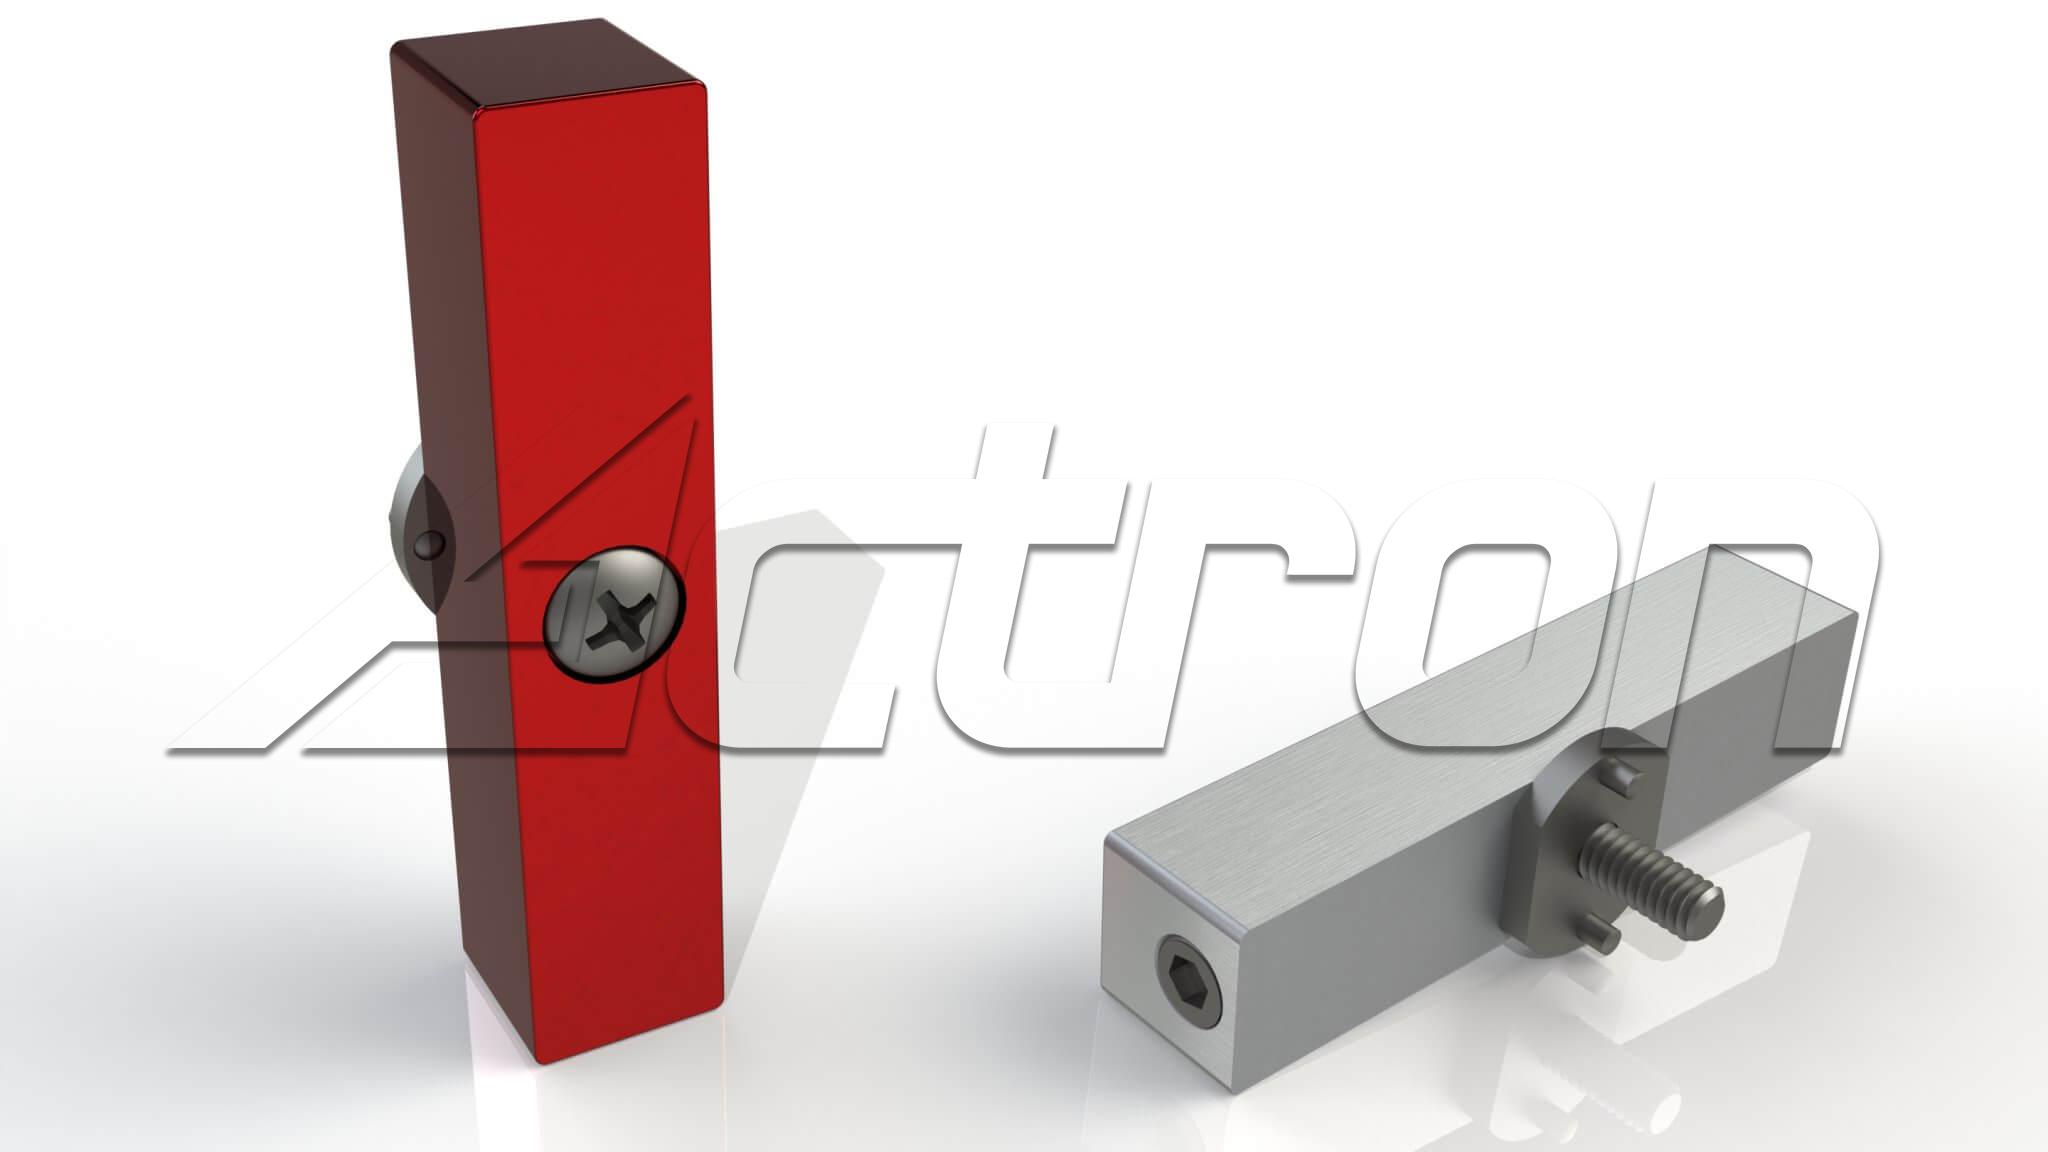 1-4-turn-retainer-4803-a35582.jpg